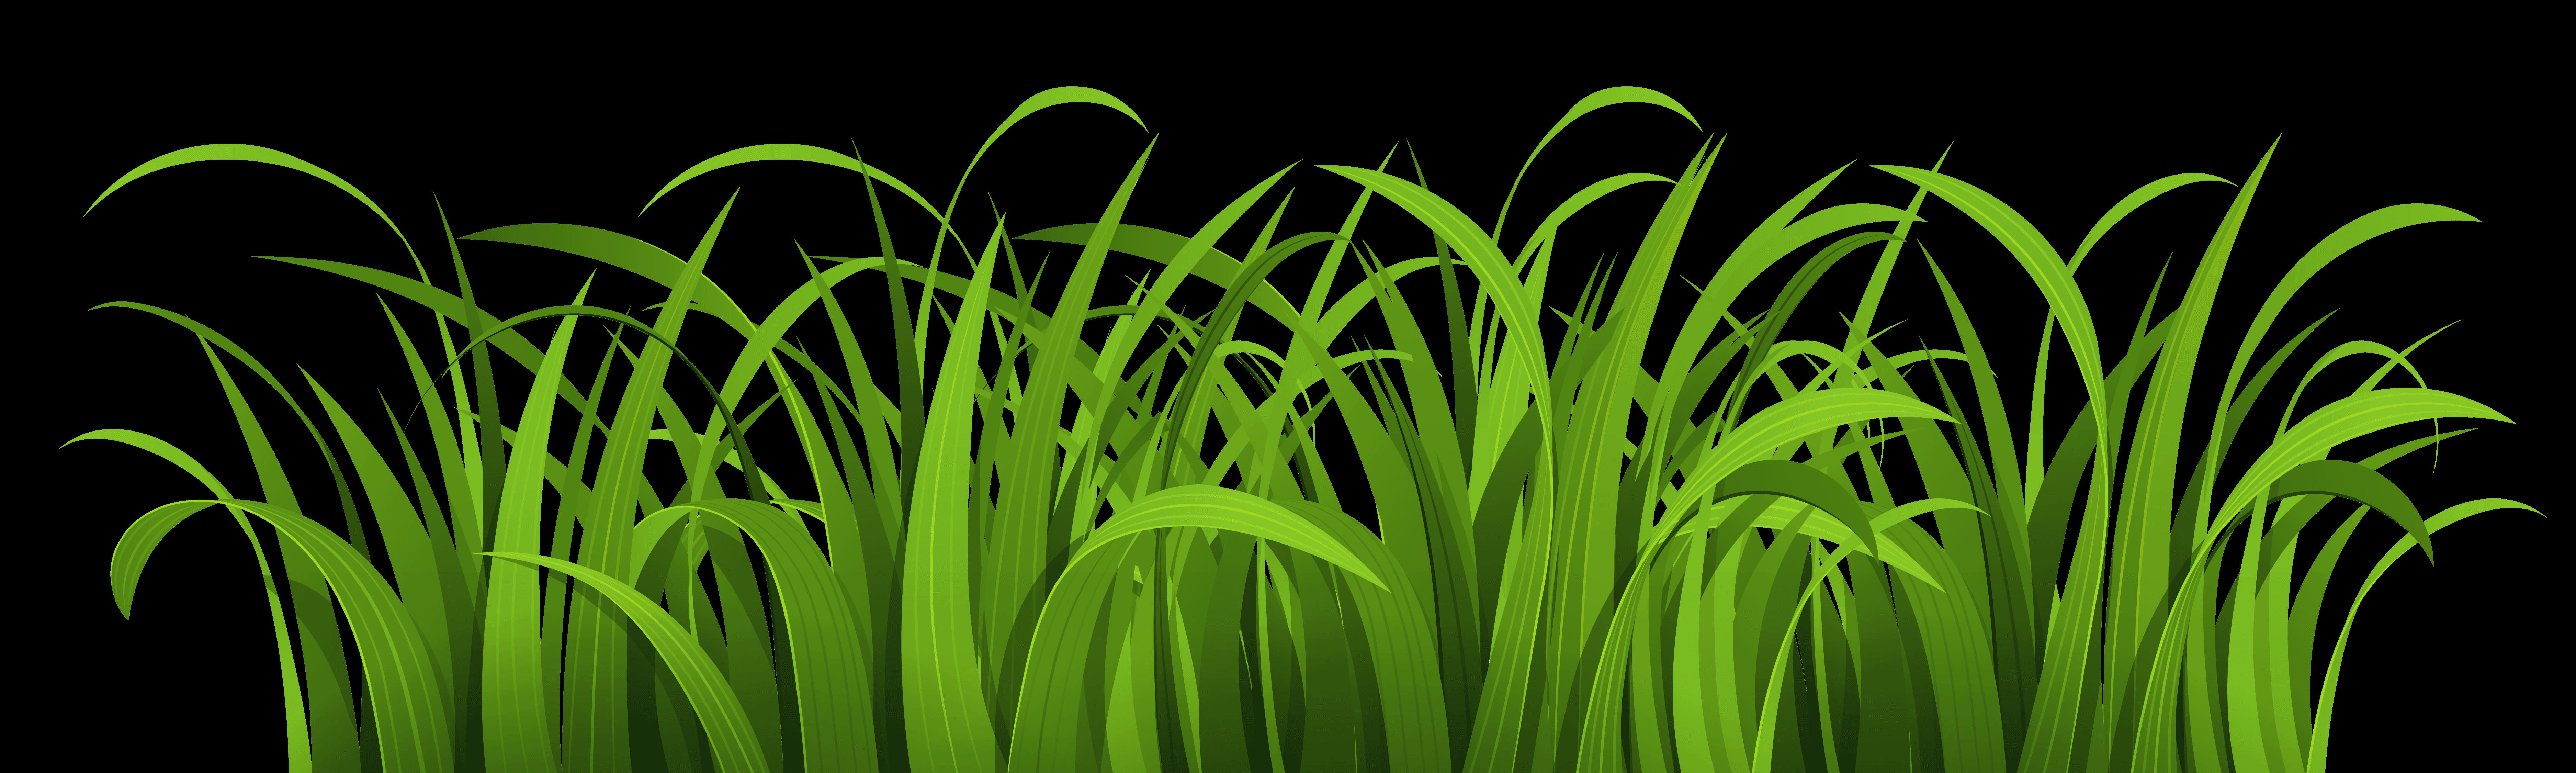 pngpix com grass vector png transparent image supernatural brand supernatural brand